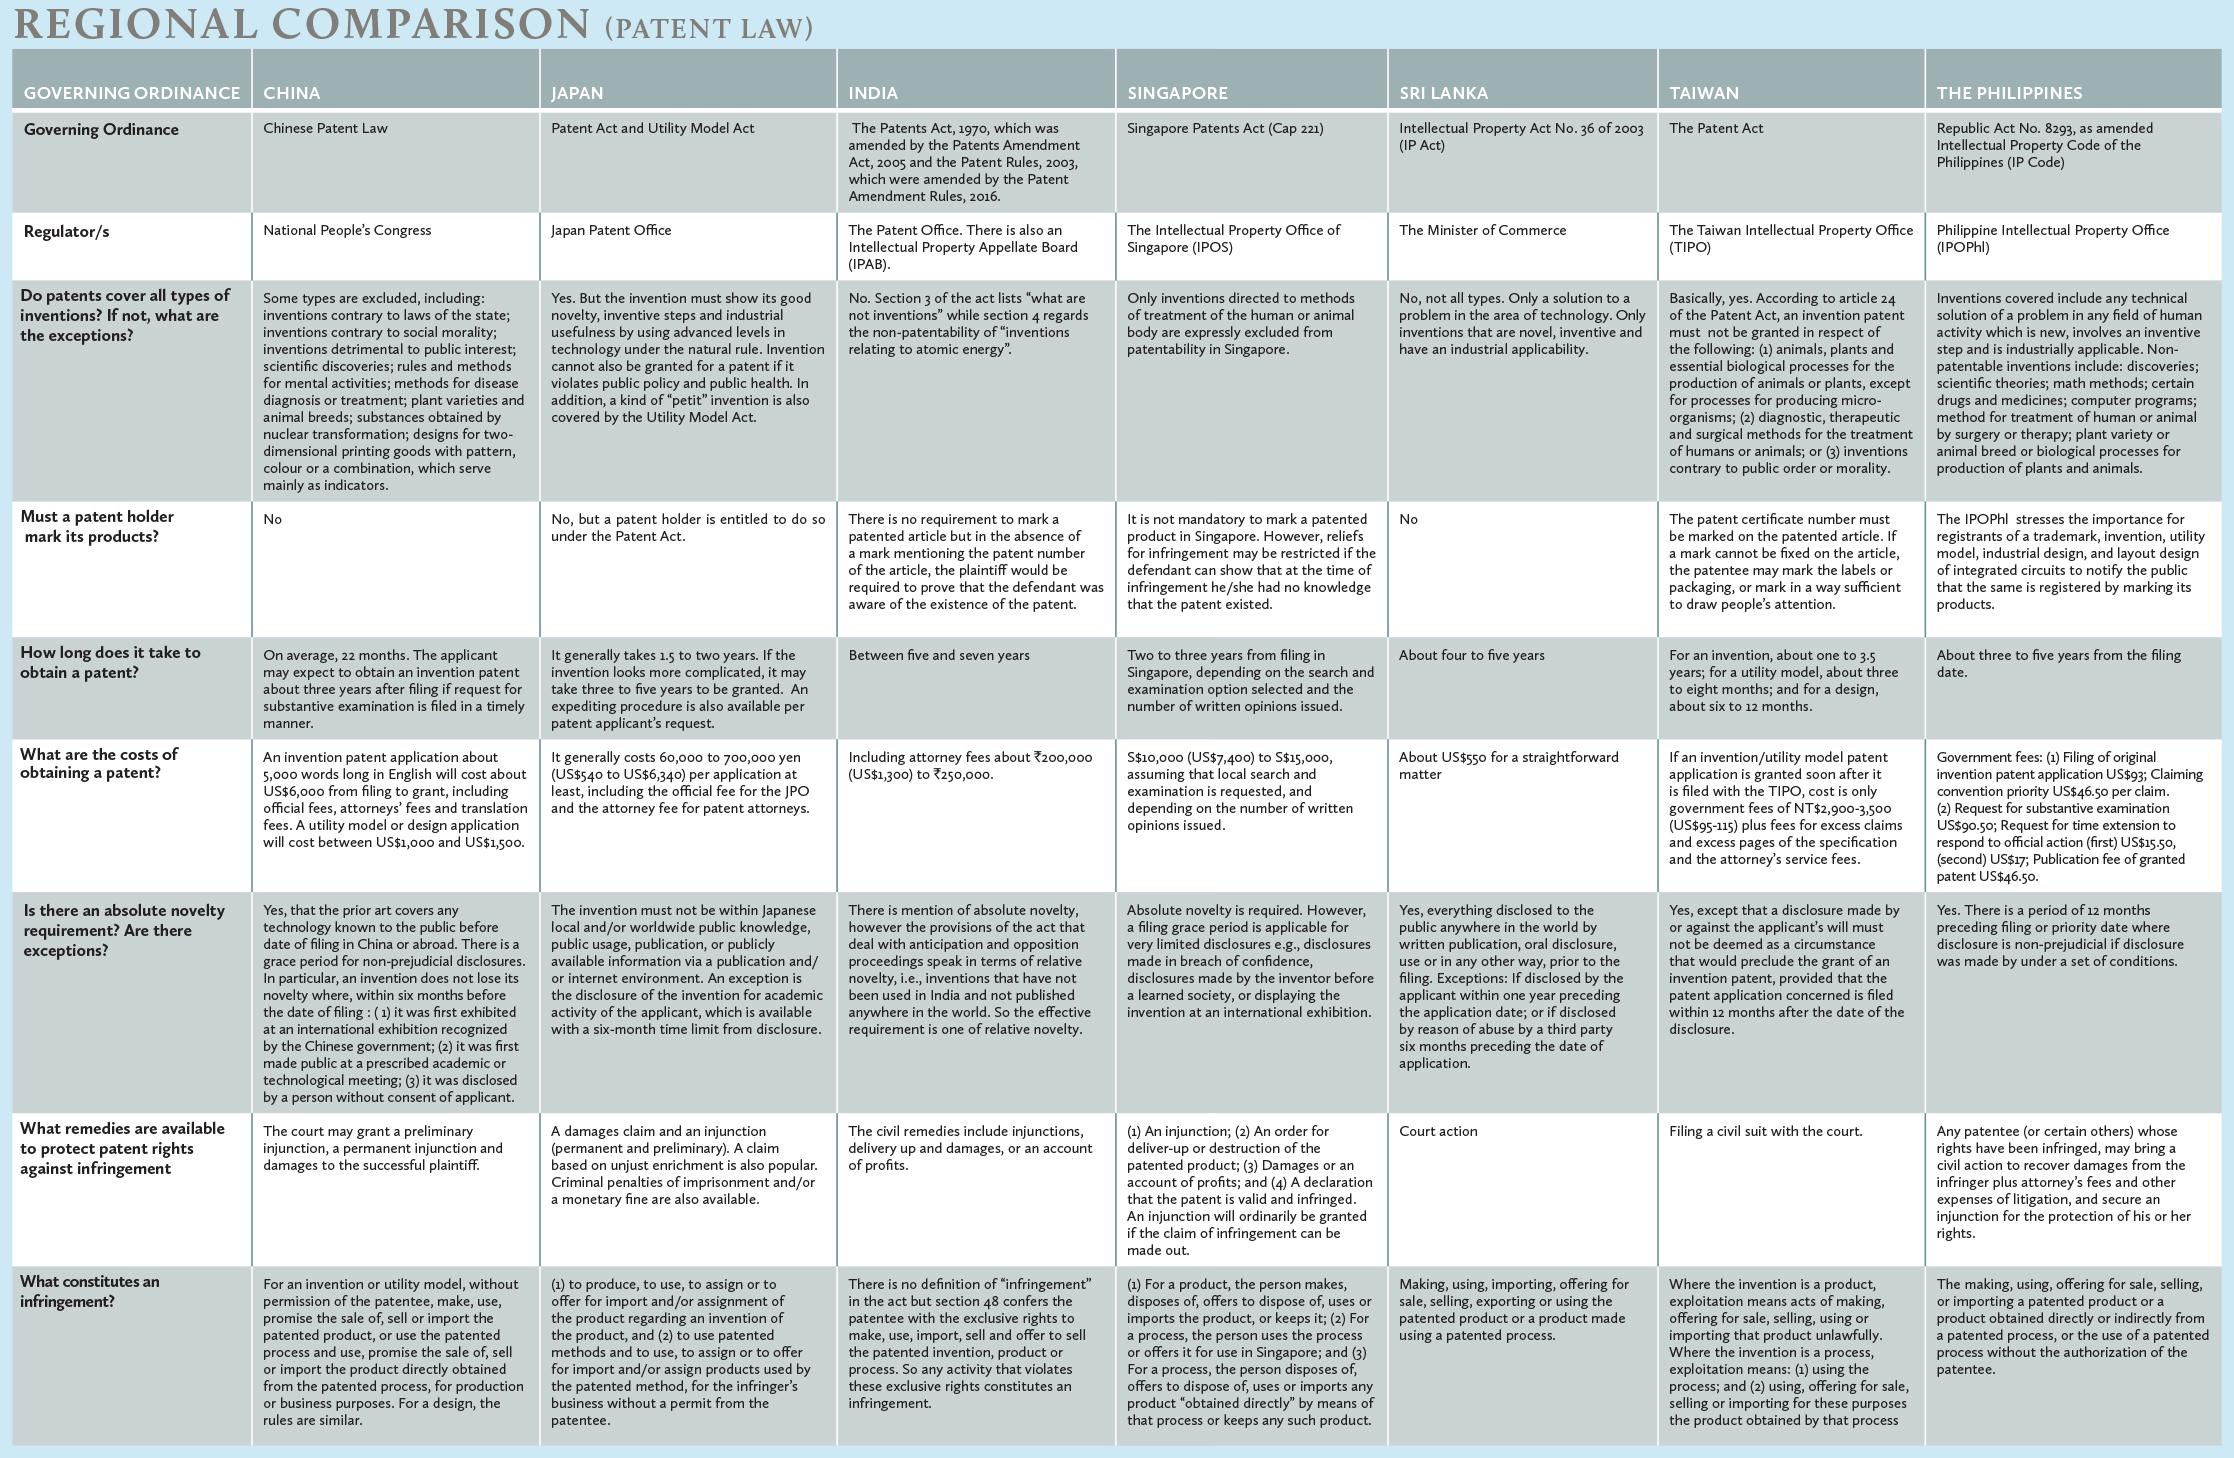 Patent-Law-Regional-Comparison-table